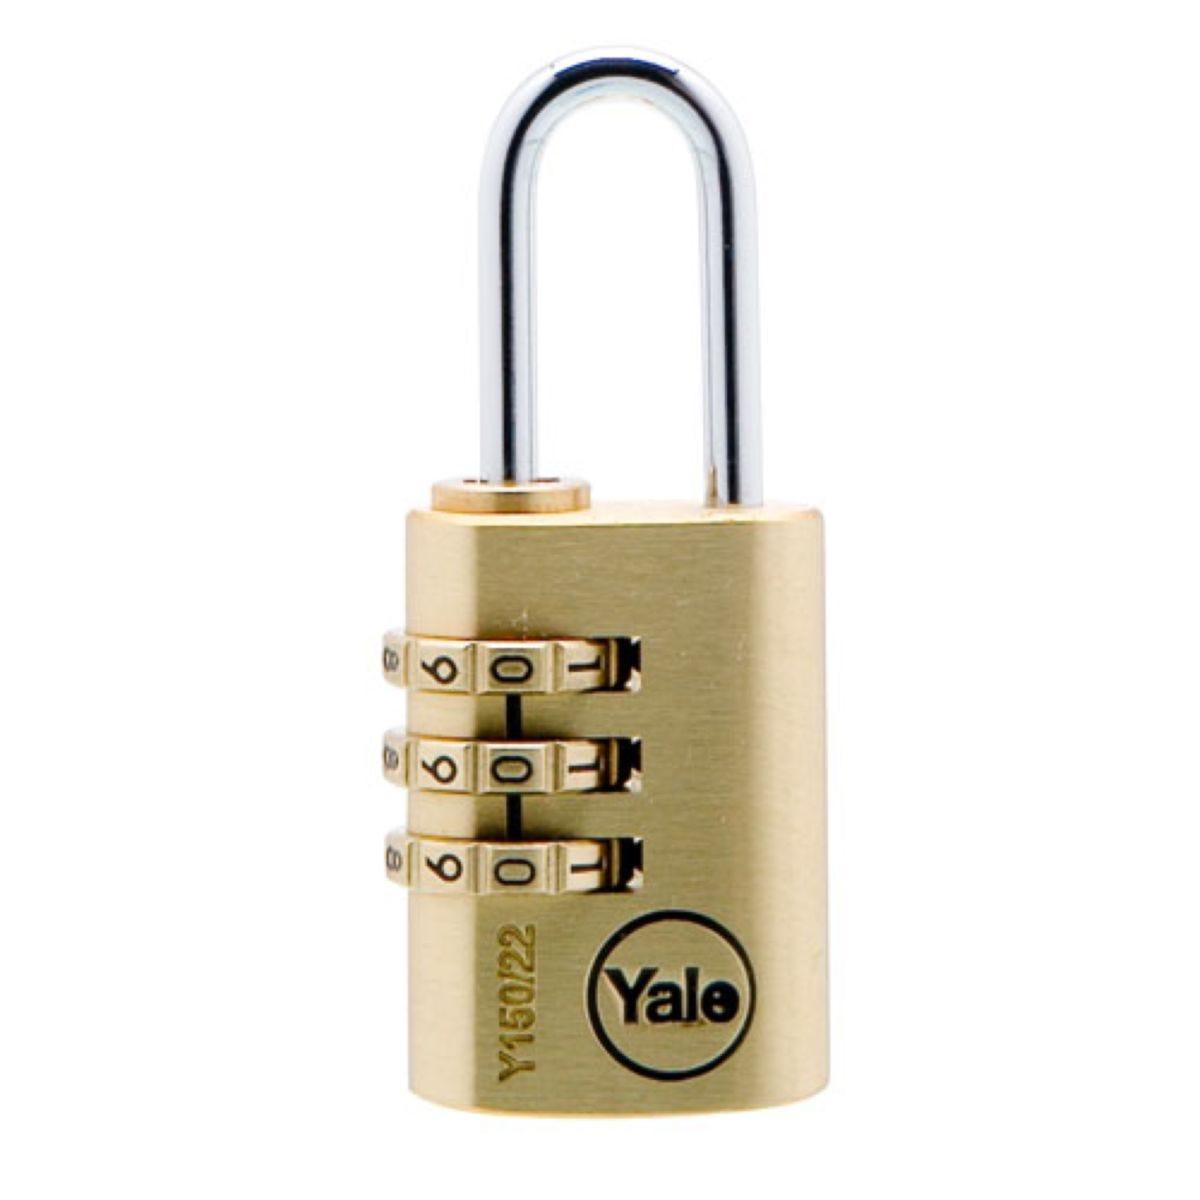 Yale 22mm Brass Combination Padlock